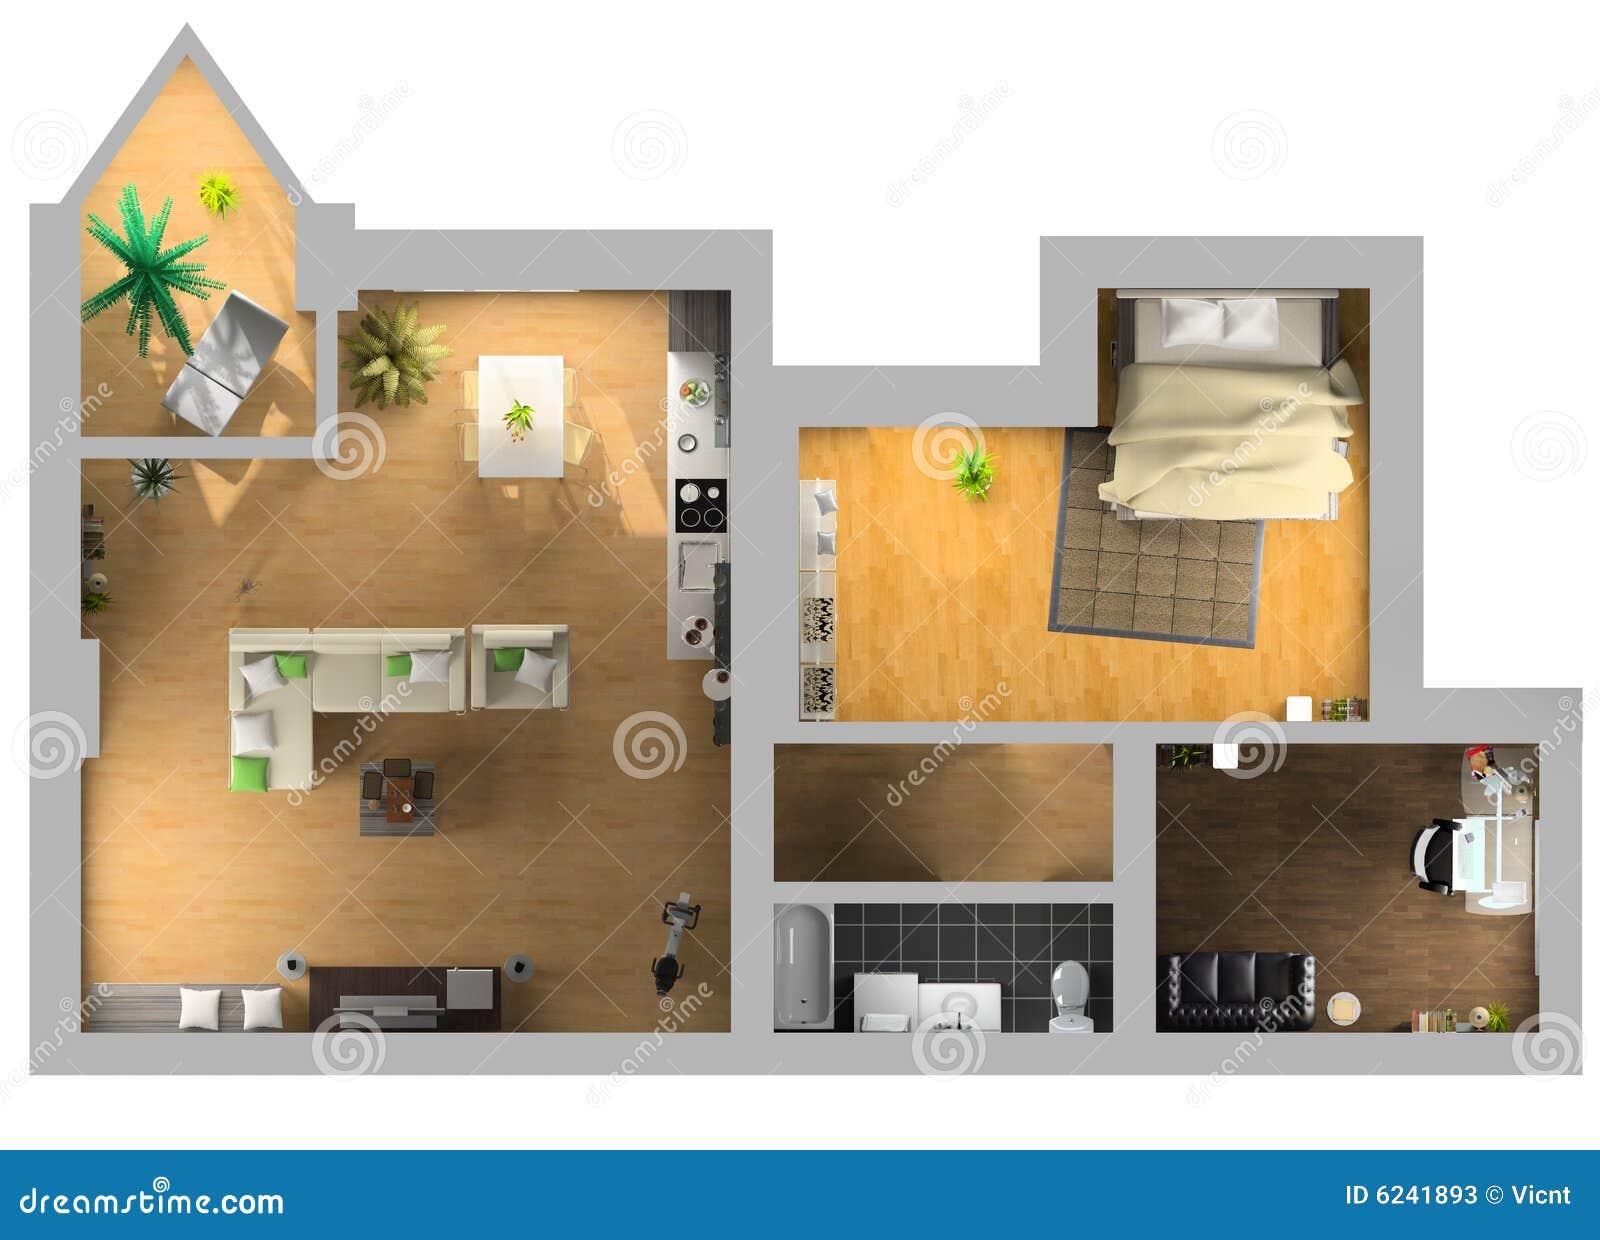 Plan interior